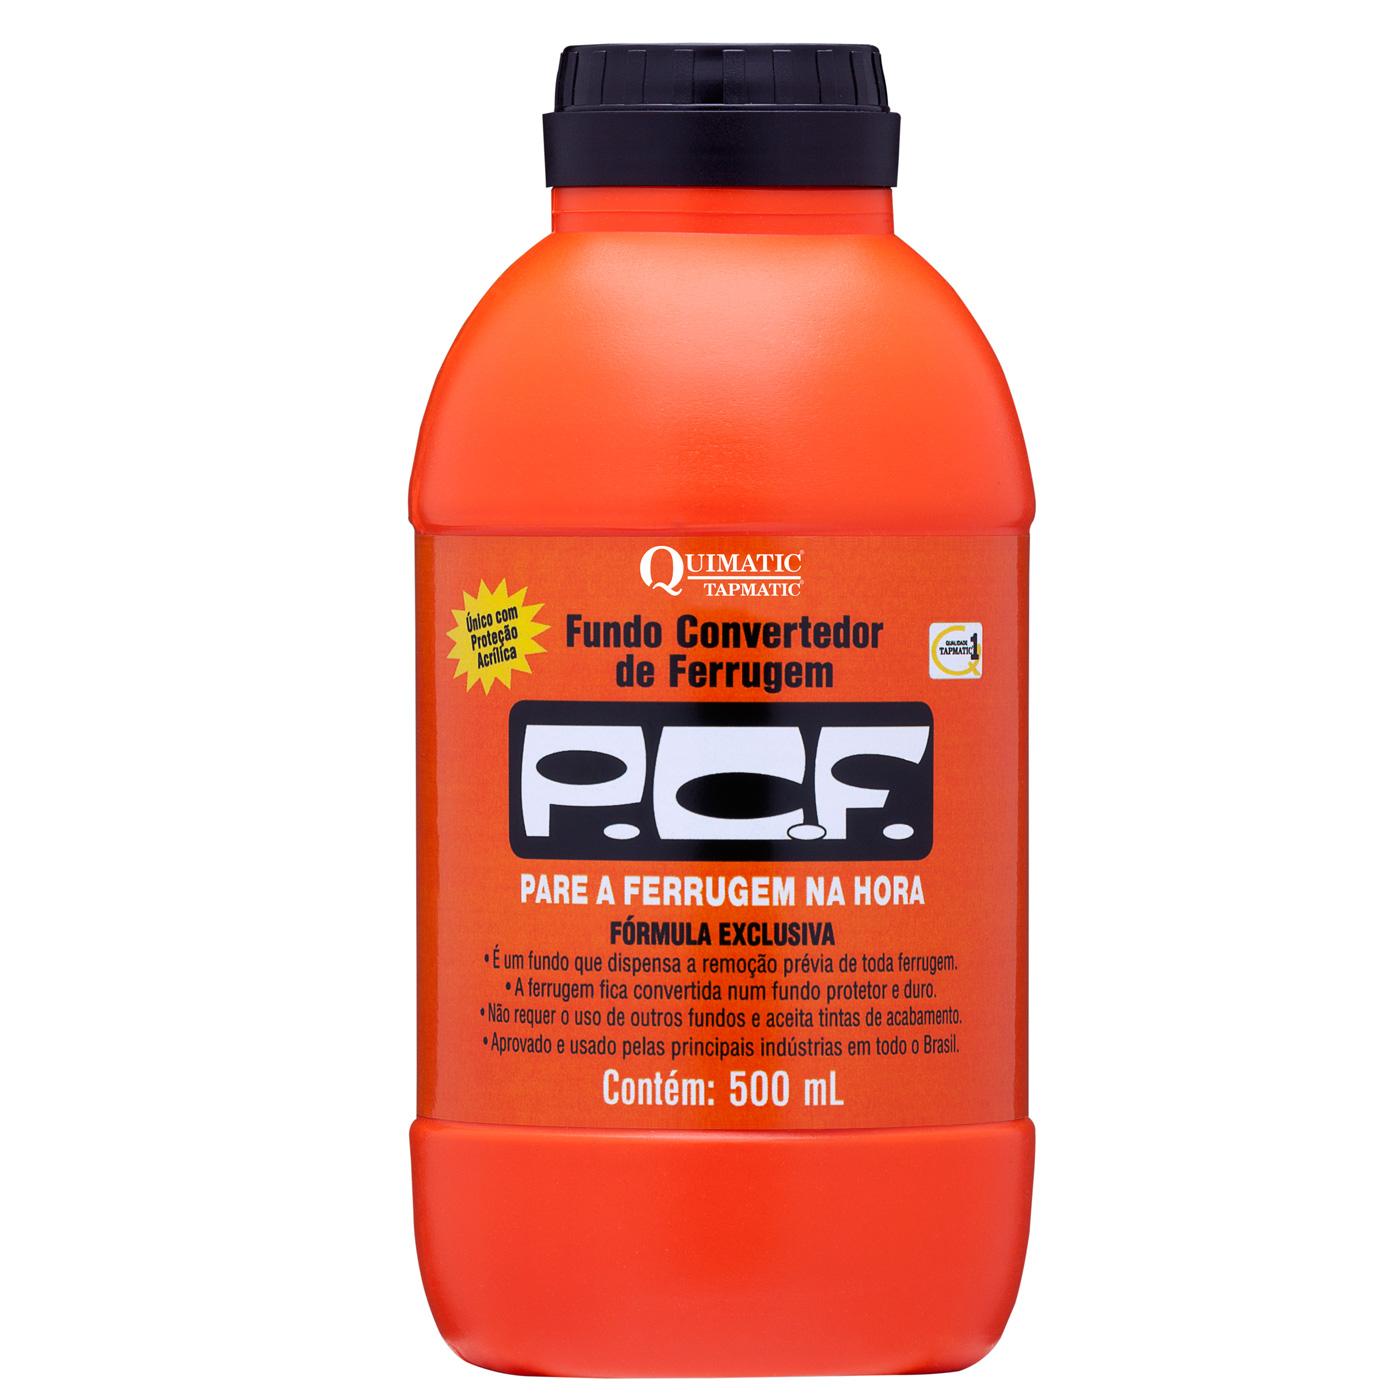 Fundo Convertedor de Ferrugem P. C. F. 500 ML